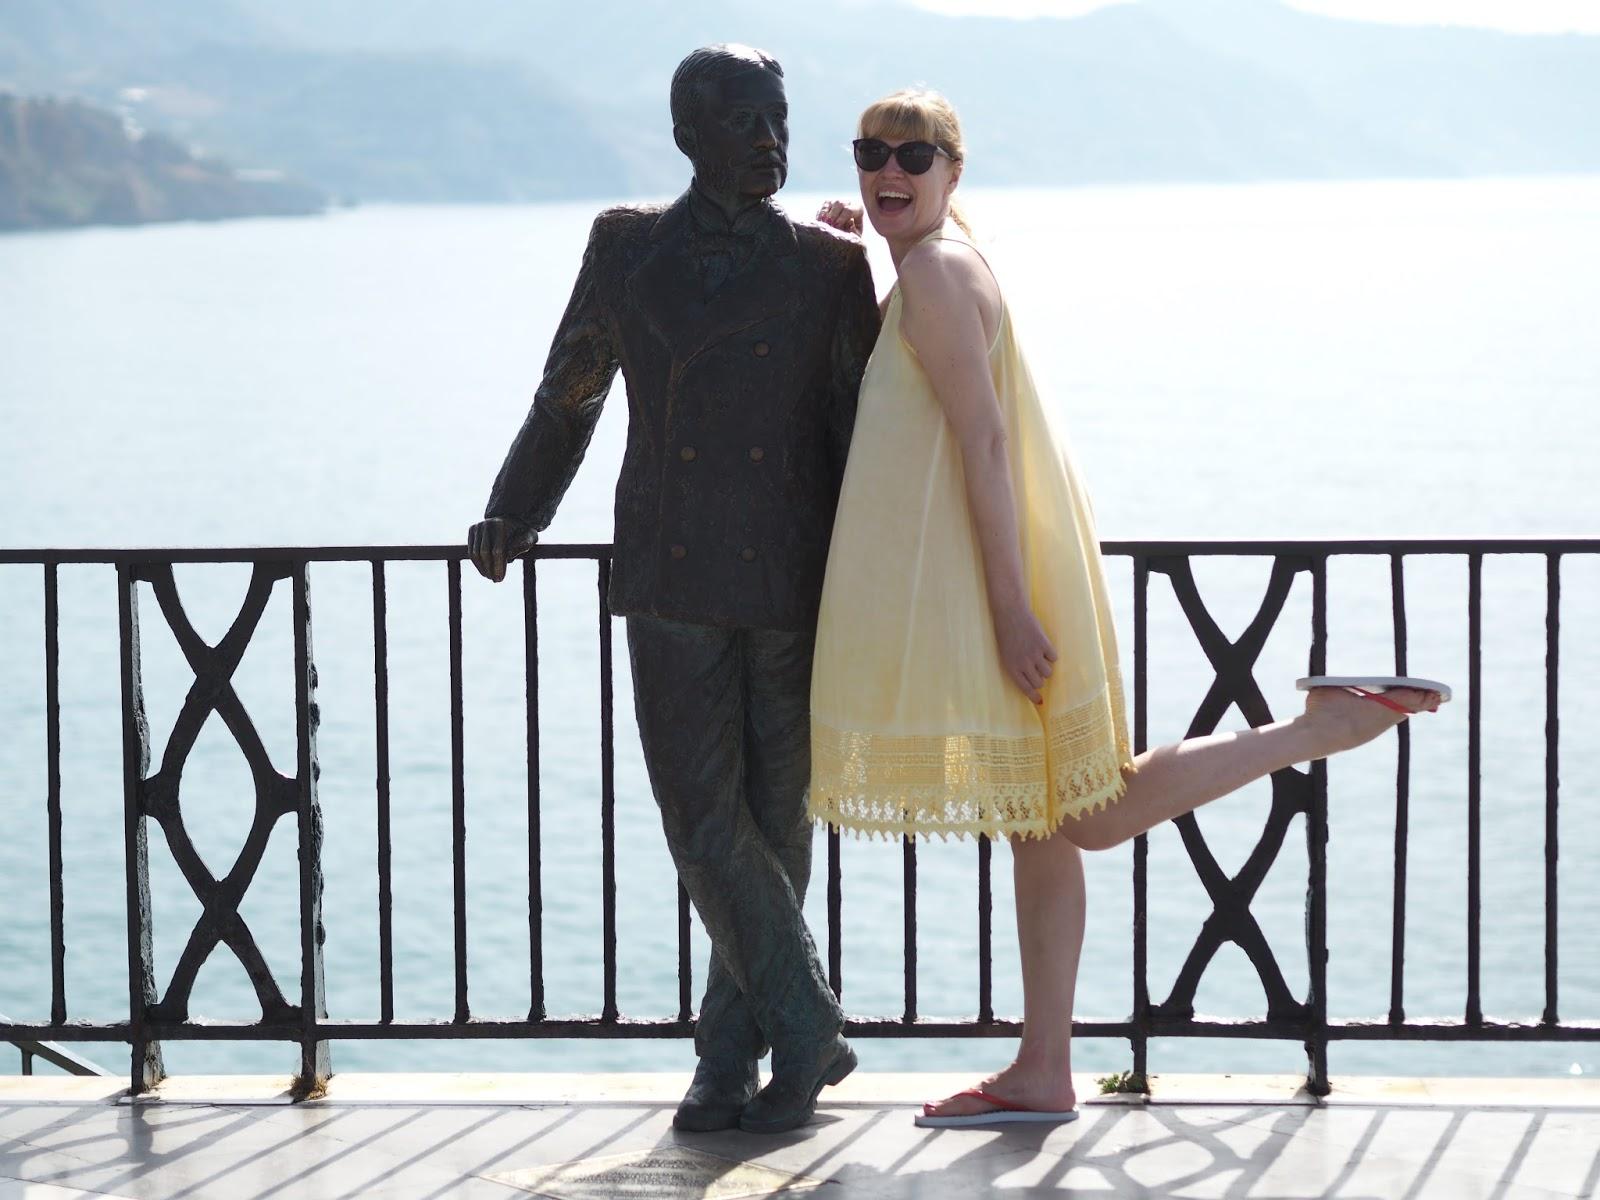 Floral bikini and yellow lace beach cover-up dress, El Balcon de Europa, Nerja